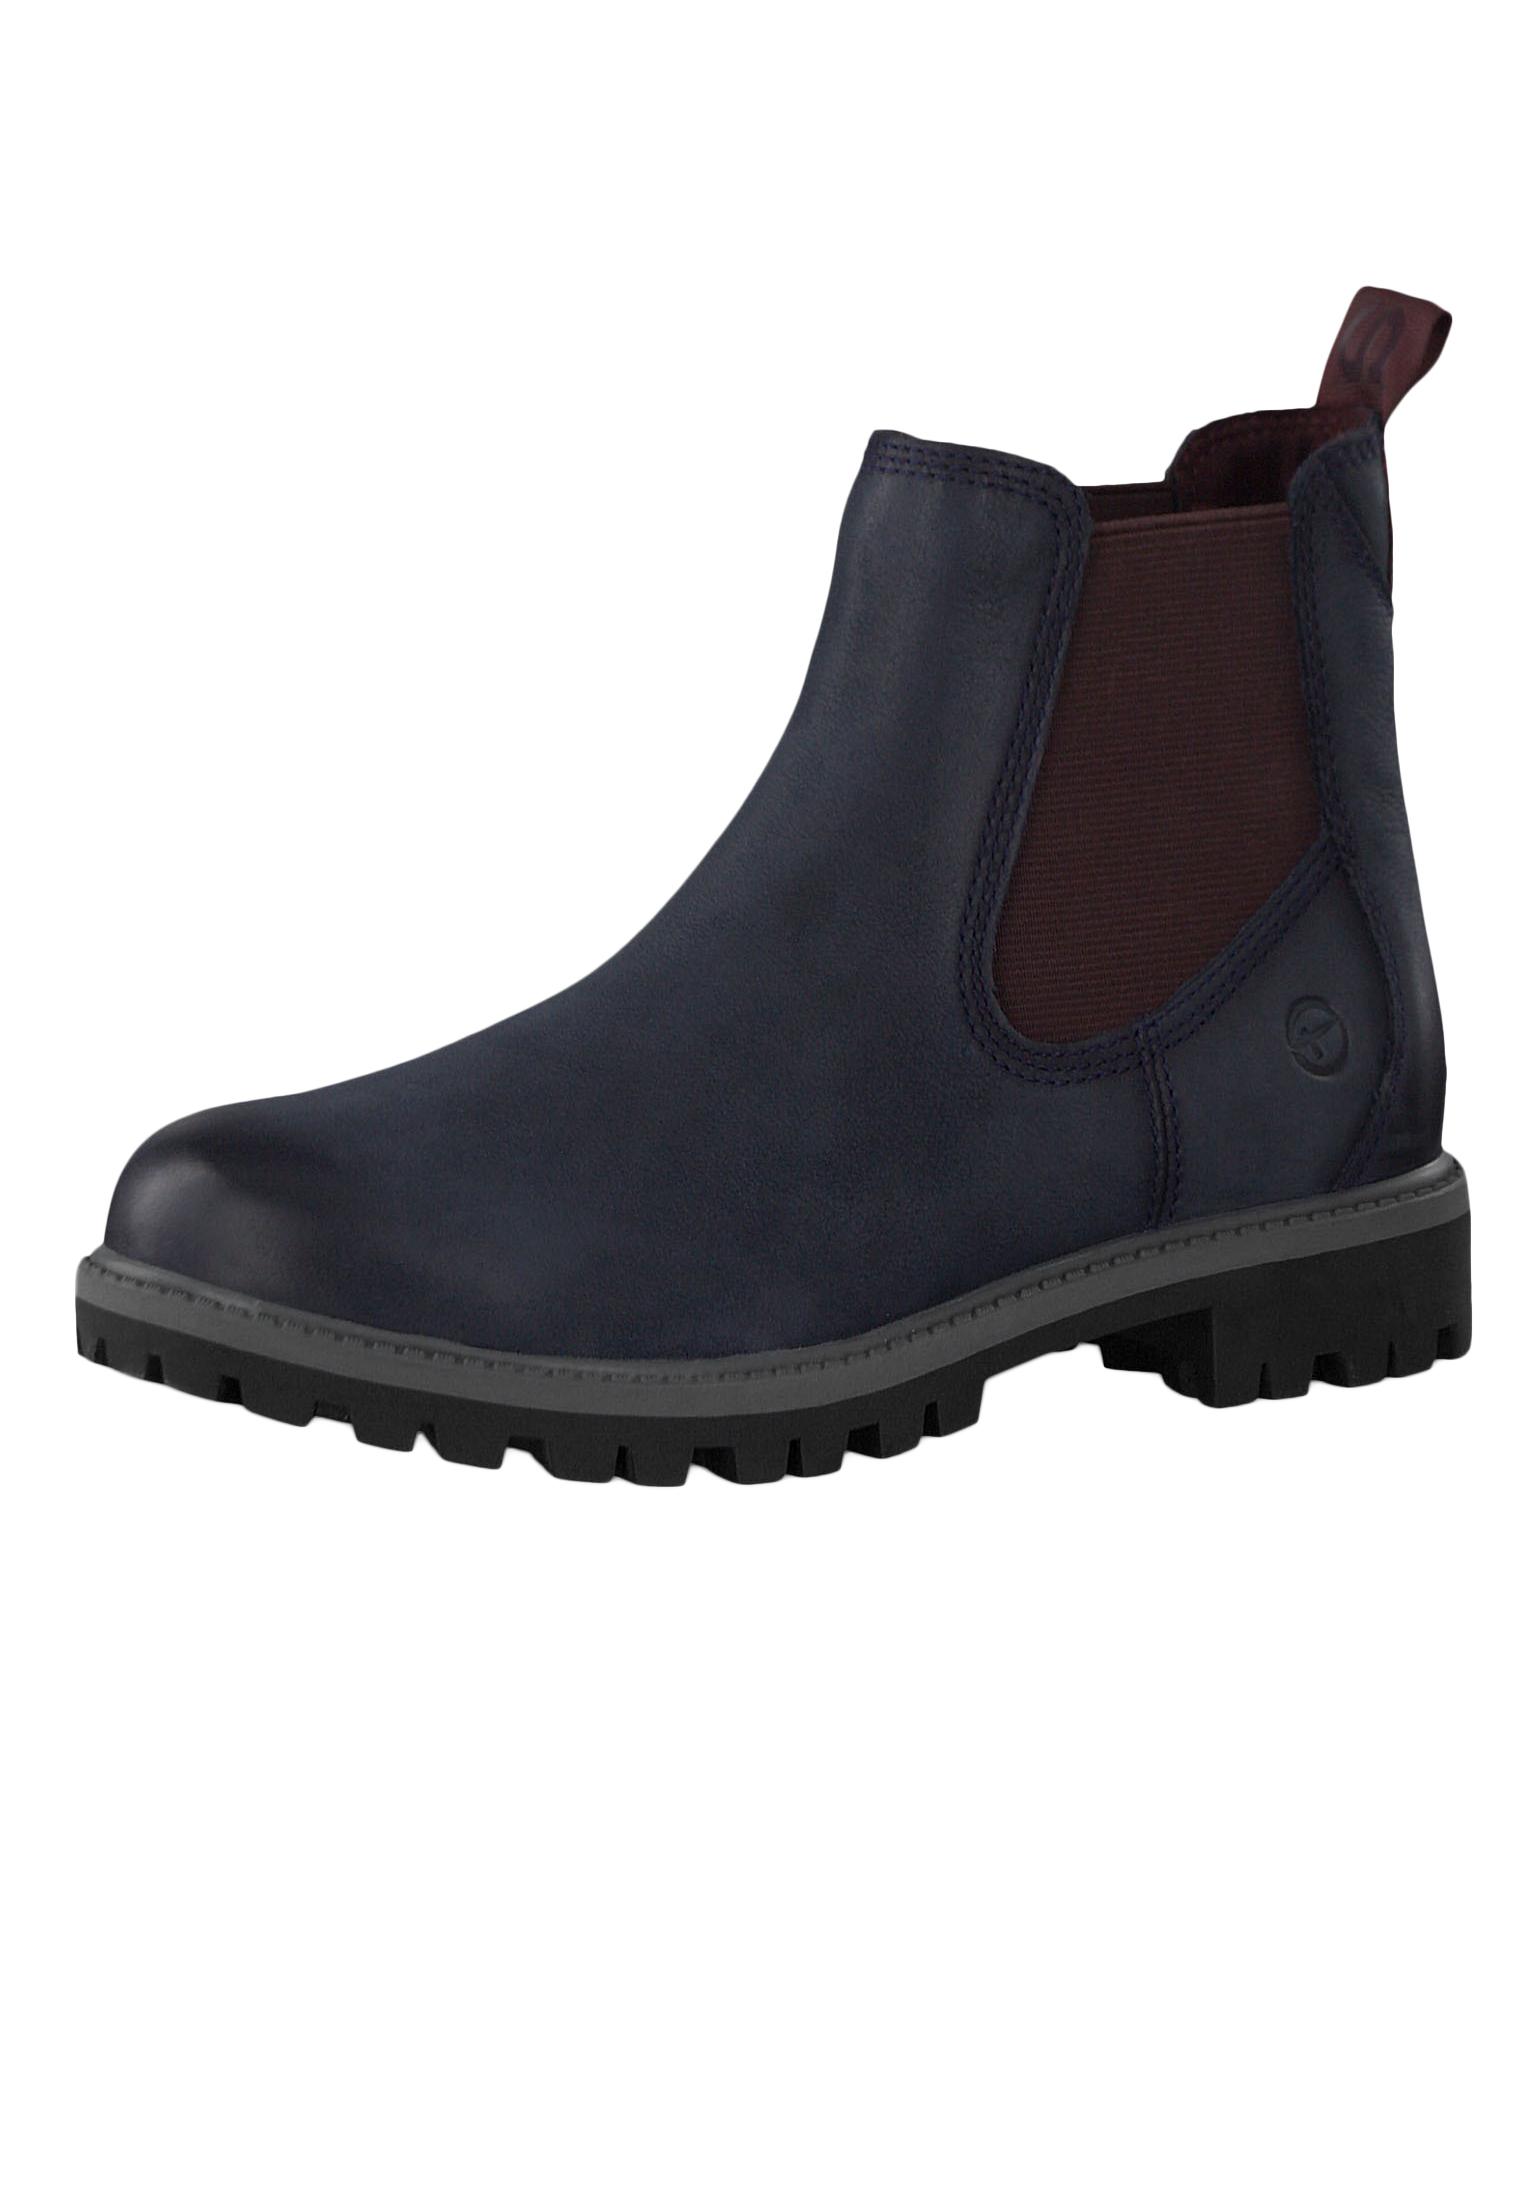 Tamaris 1 25401 23 817 Damen Stiefelette Chelsea Boots